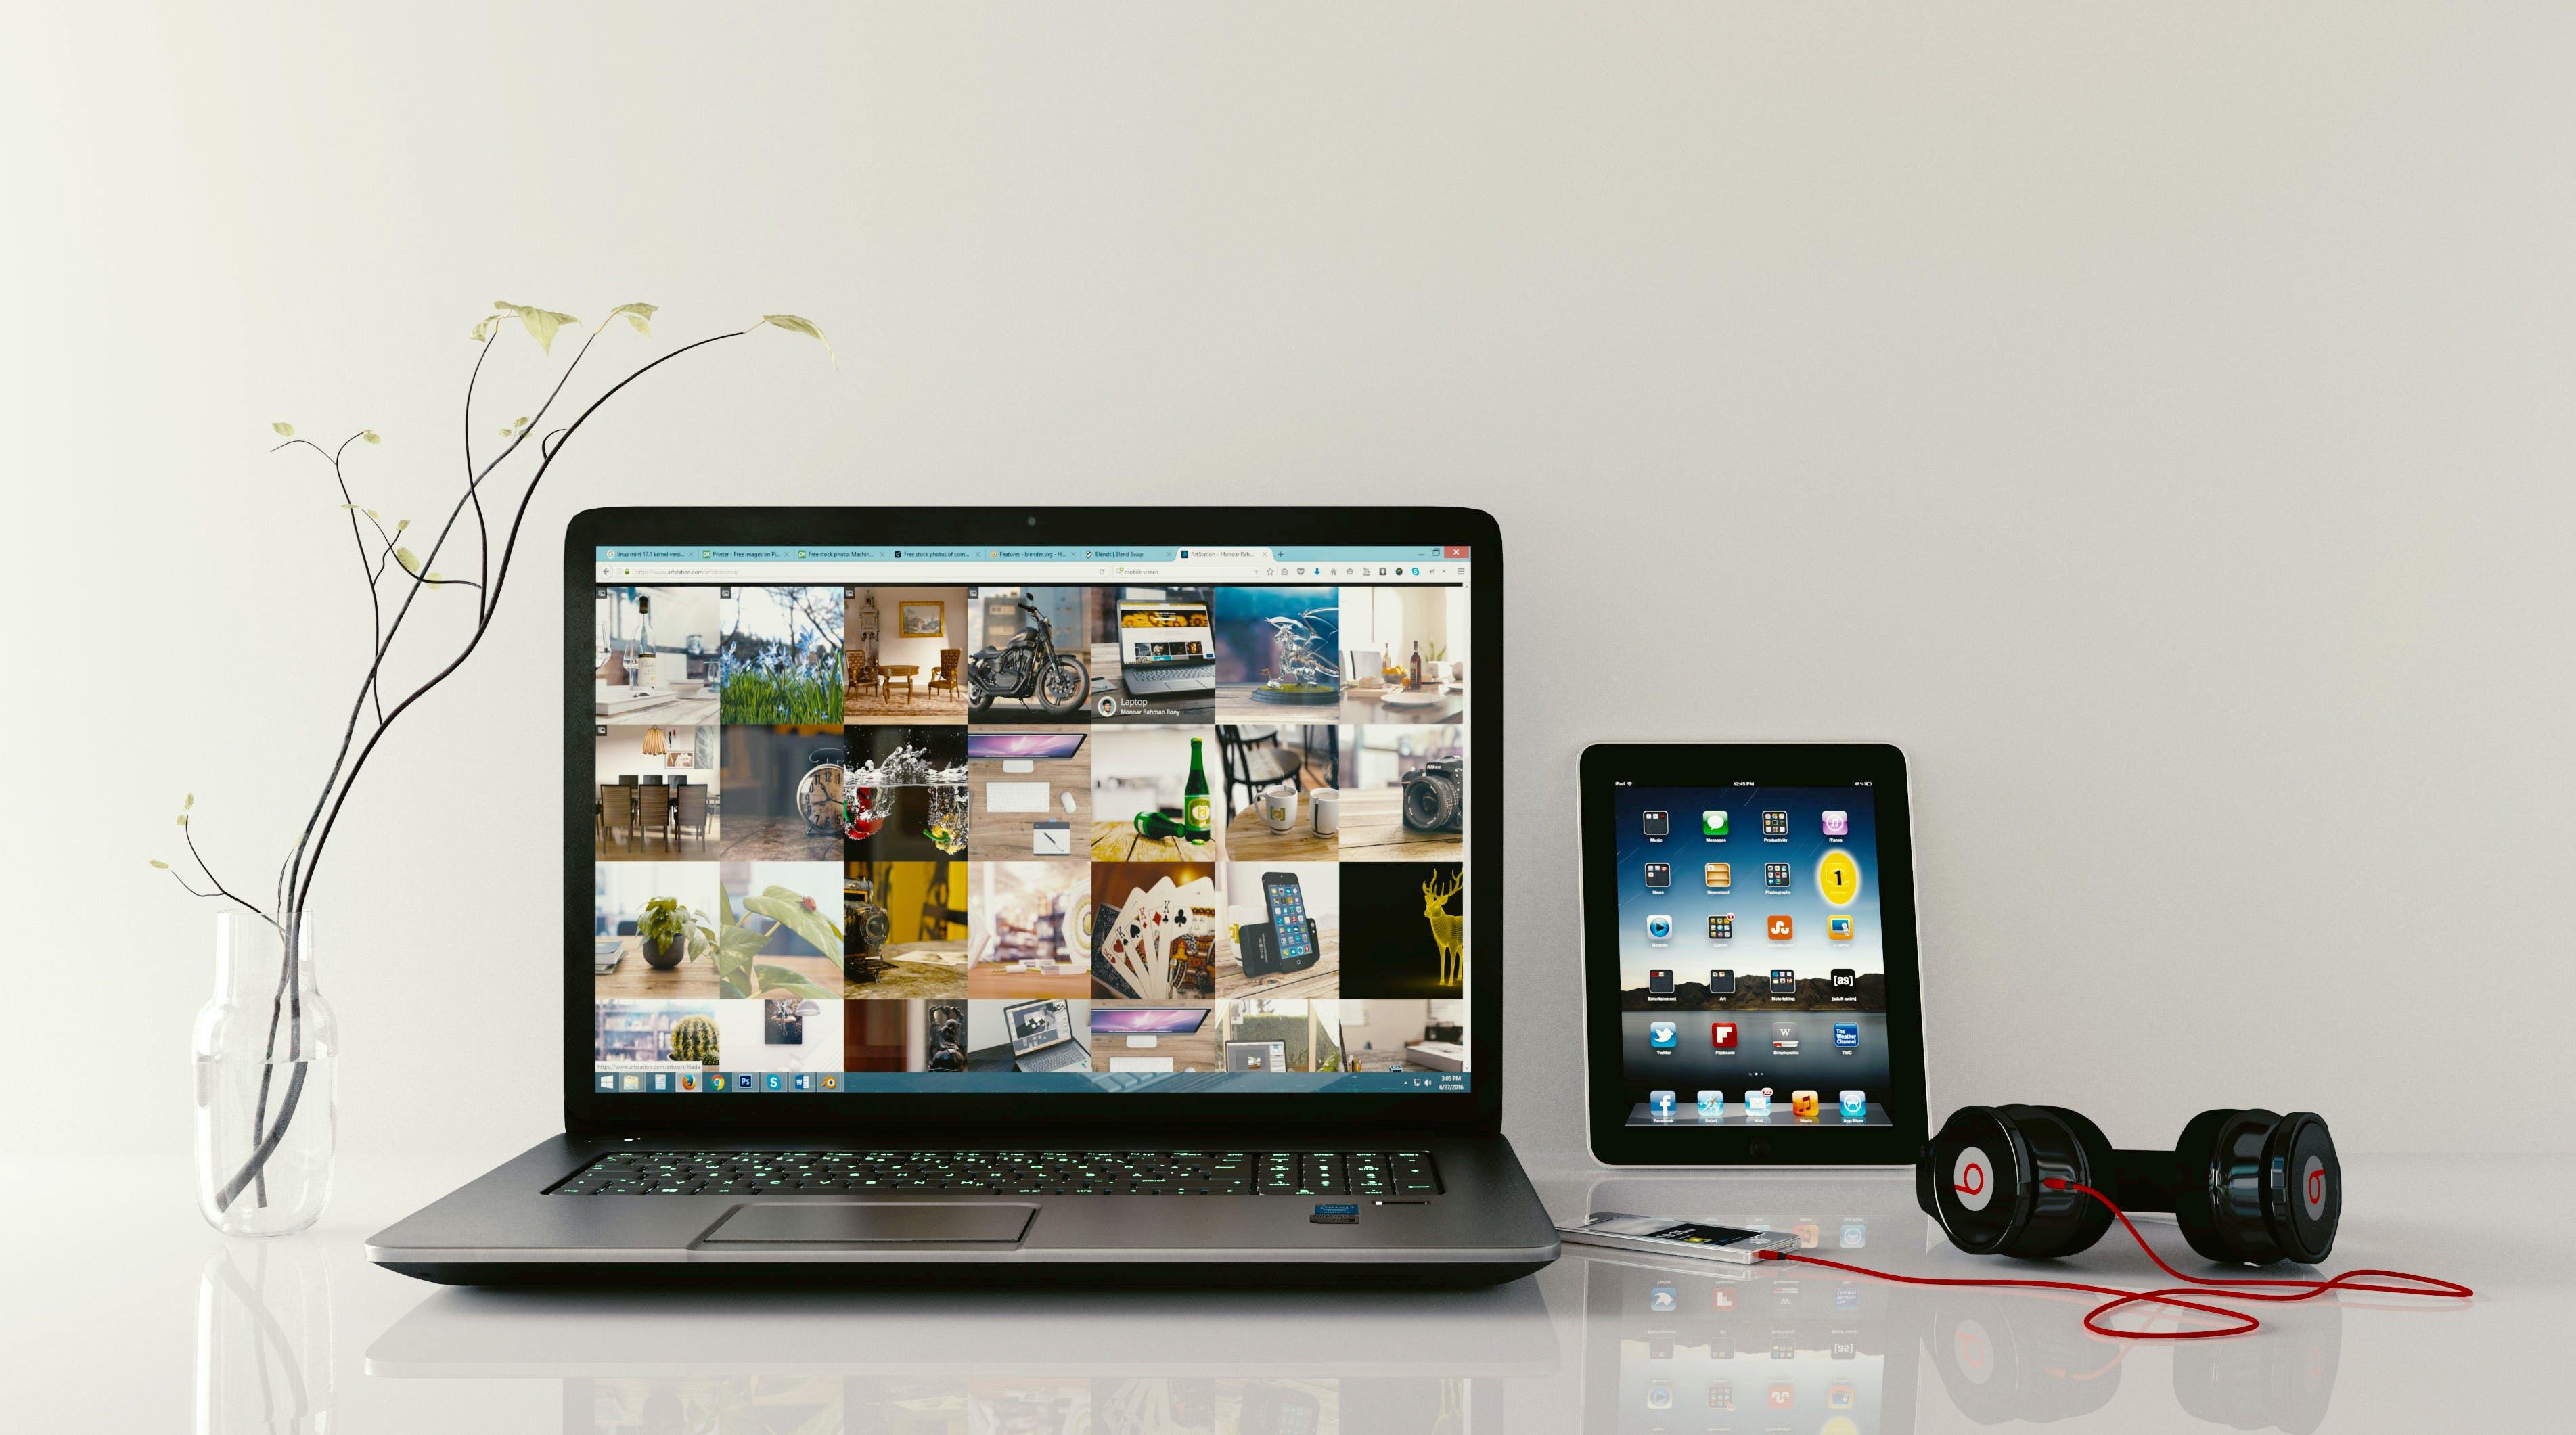 thirdbracket, 墊子, 工作站, 搅拌机摄影 的 免费素材照片